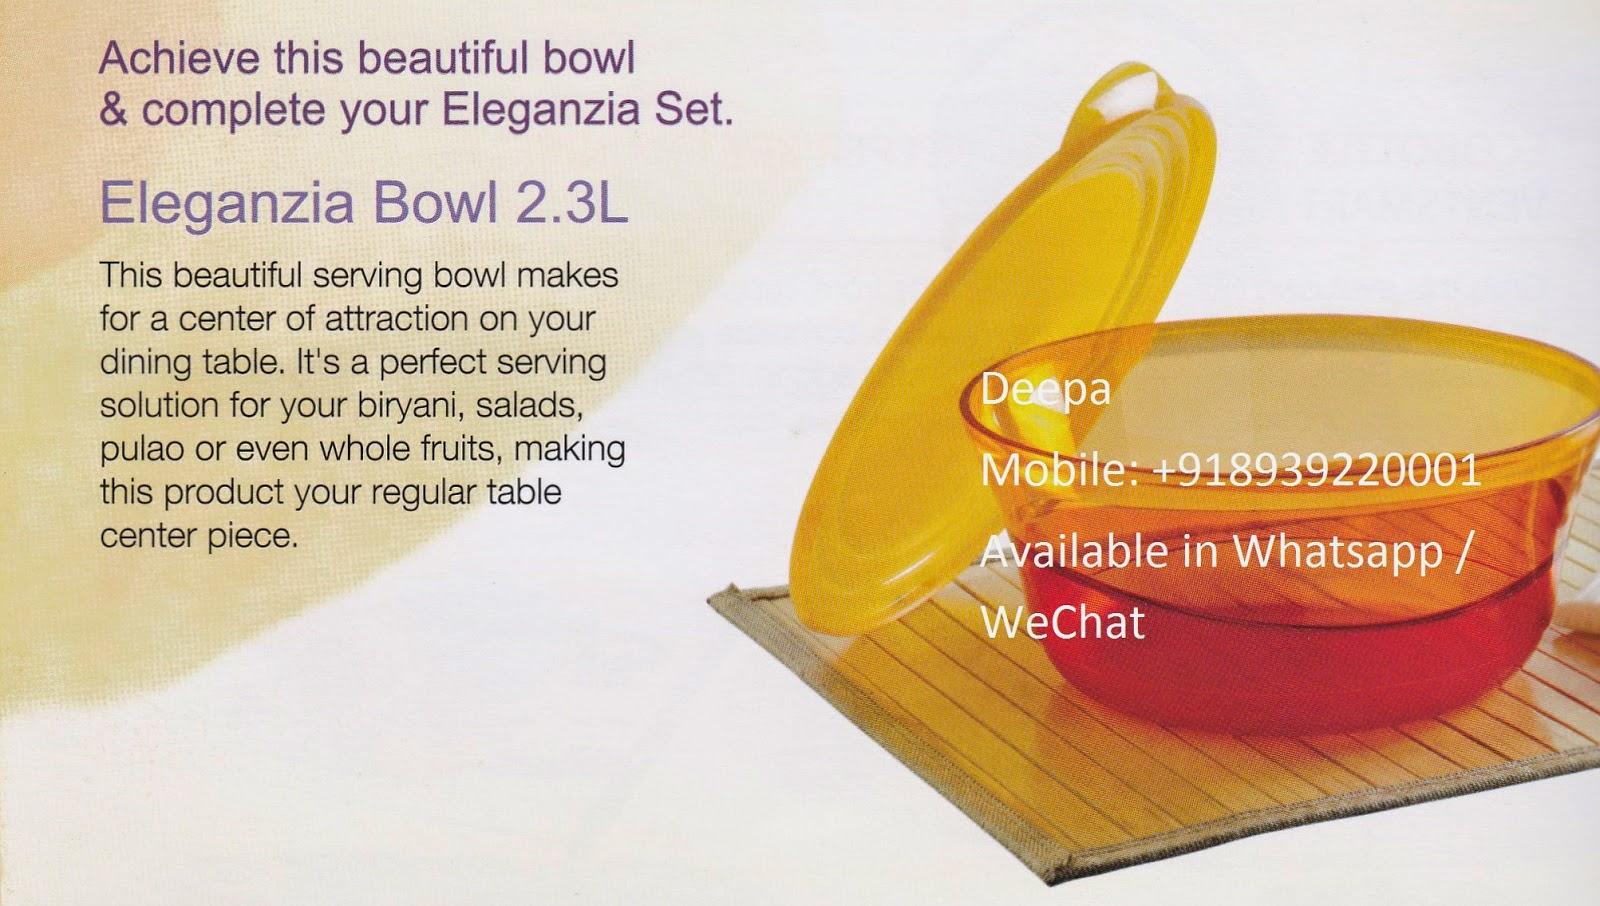 Tupperware India September 2012 Eleganzia Bowl 600ml 4 Set 23ltrs